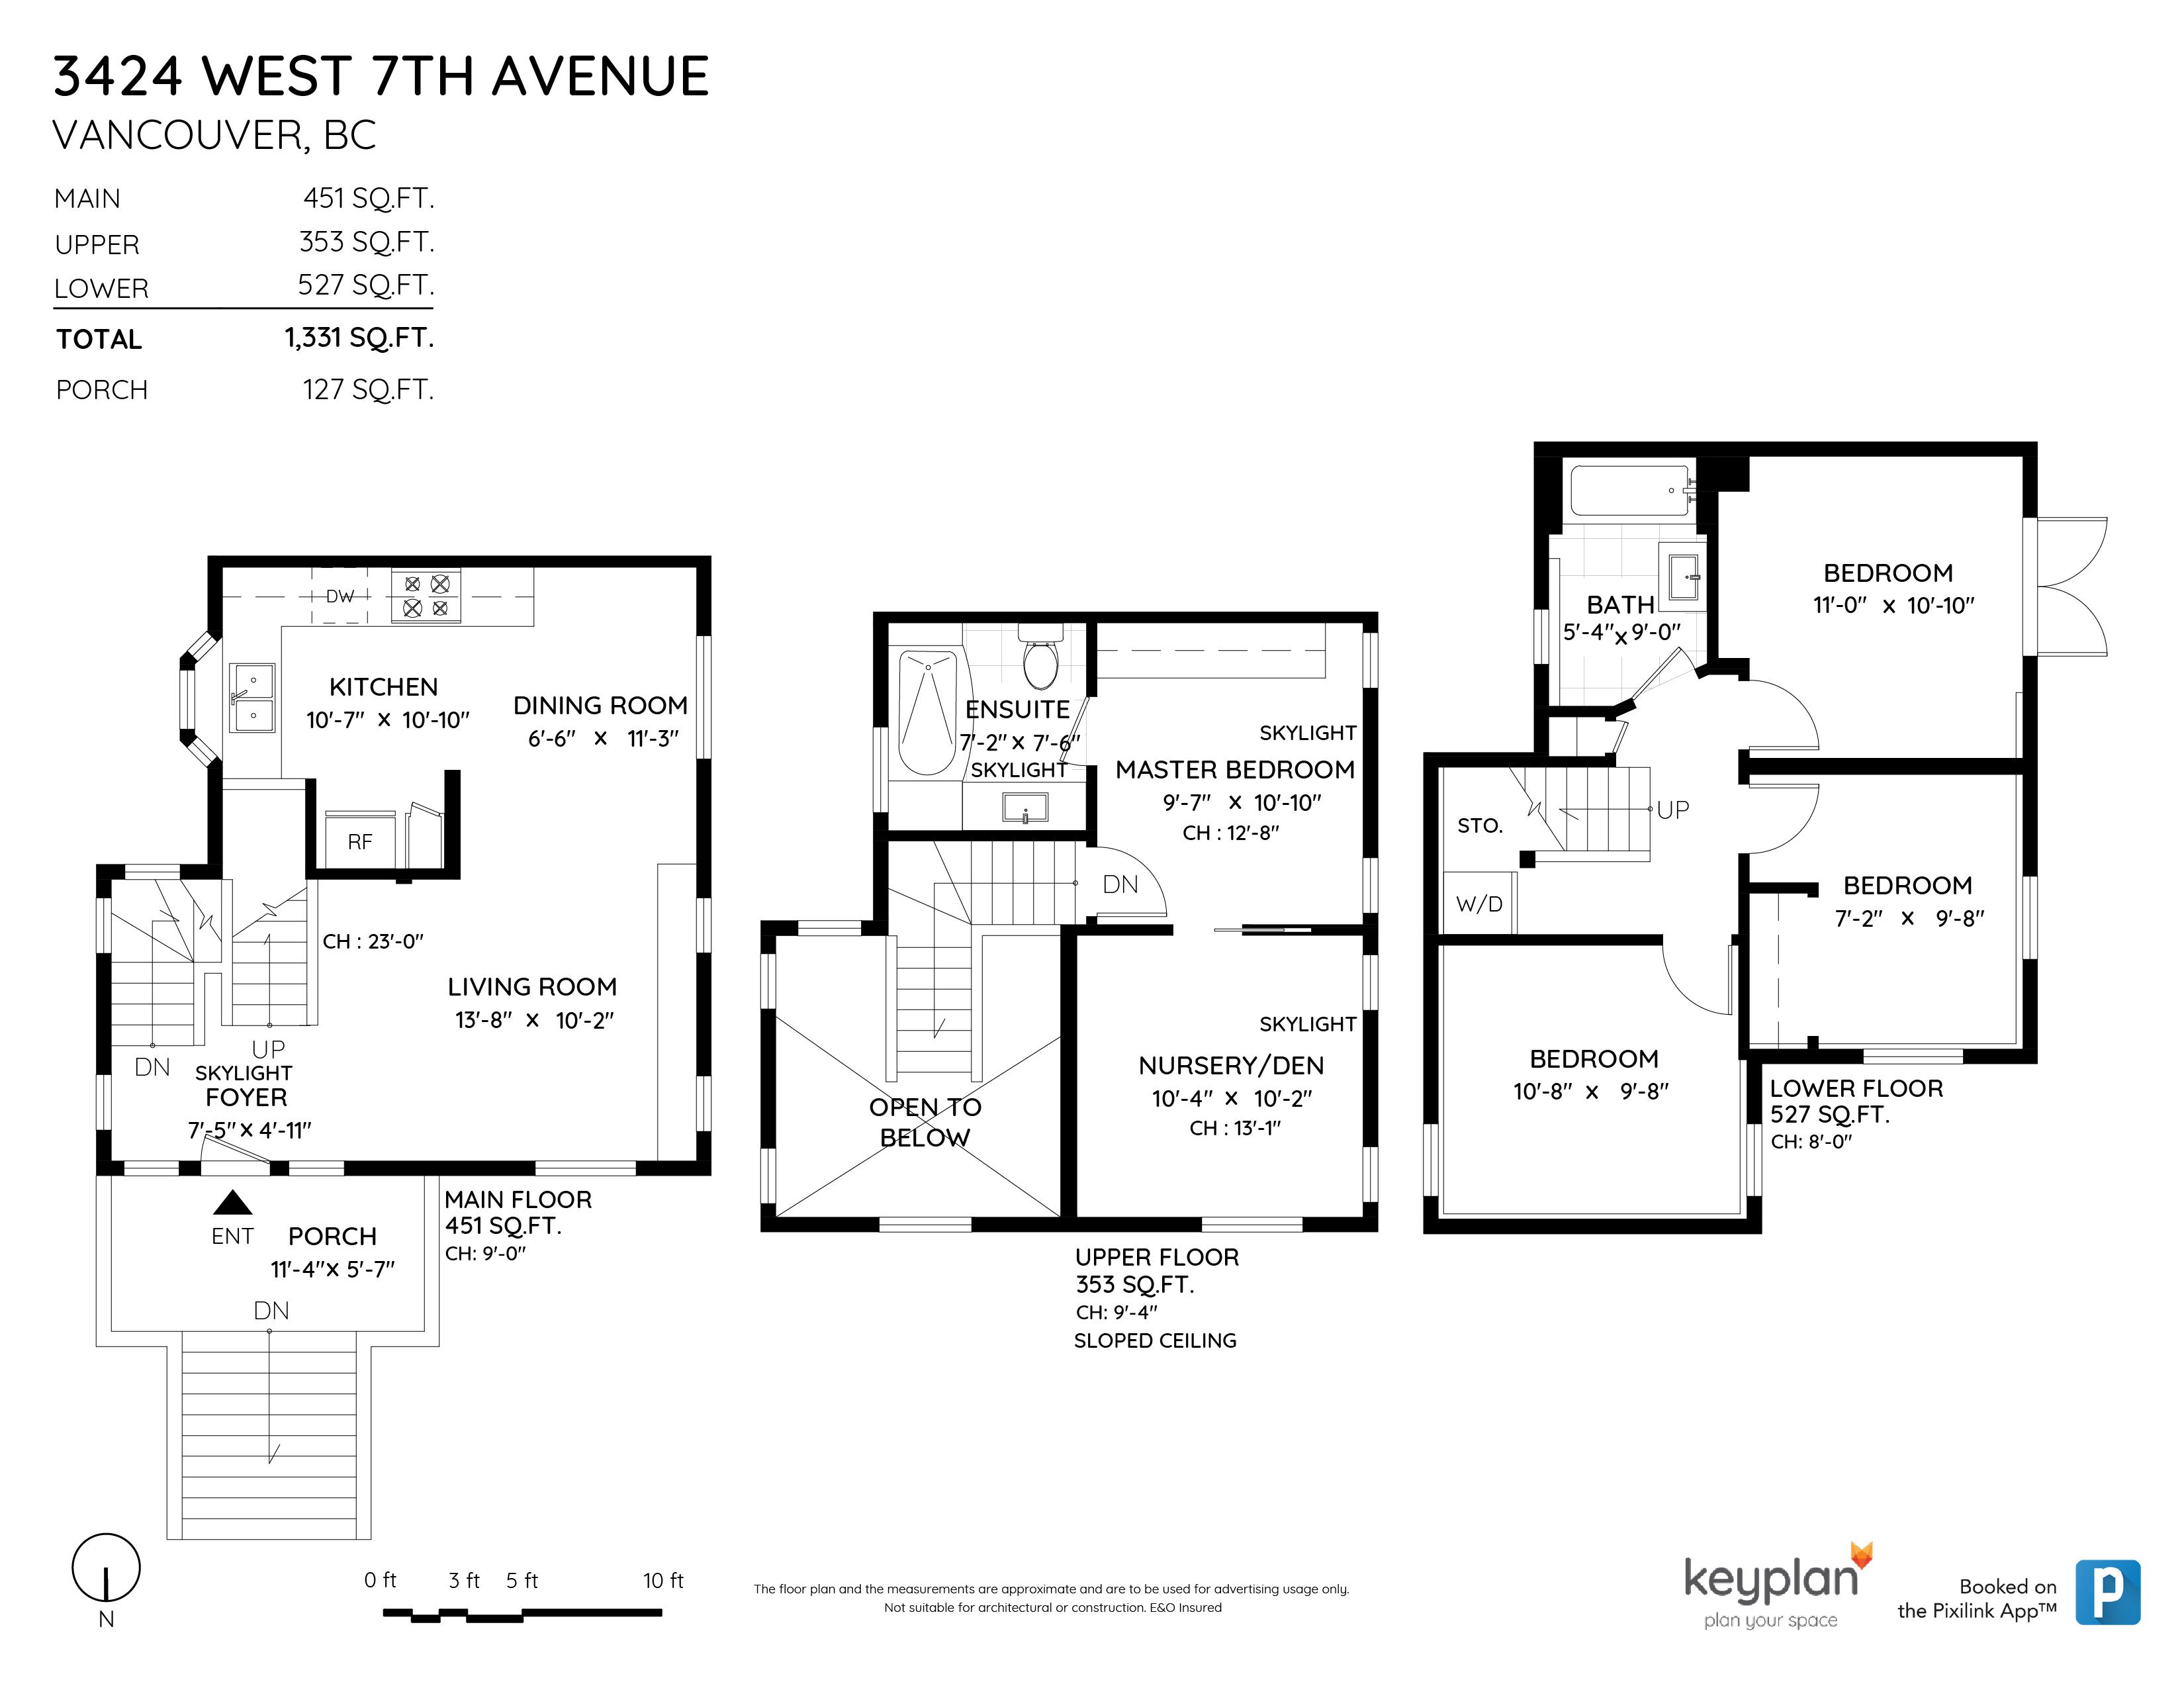 3424 W 7TH AVENUE, Vancouver, BC Floor Plan